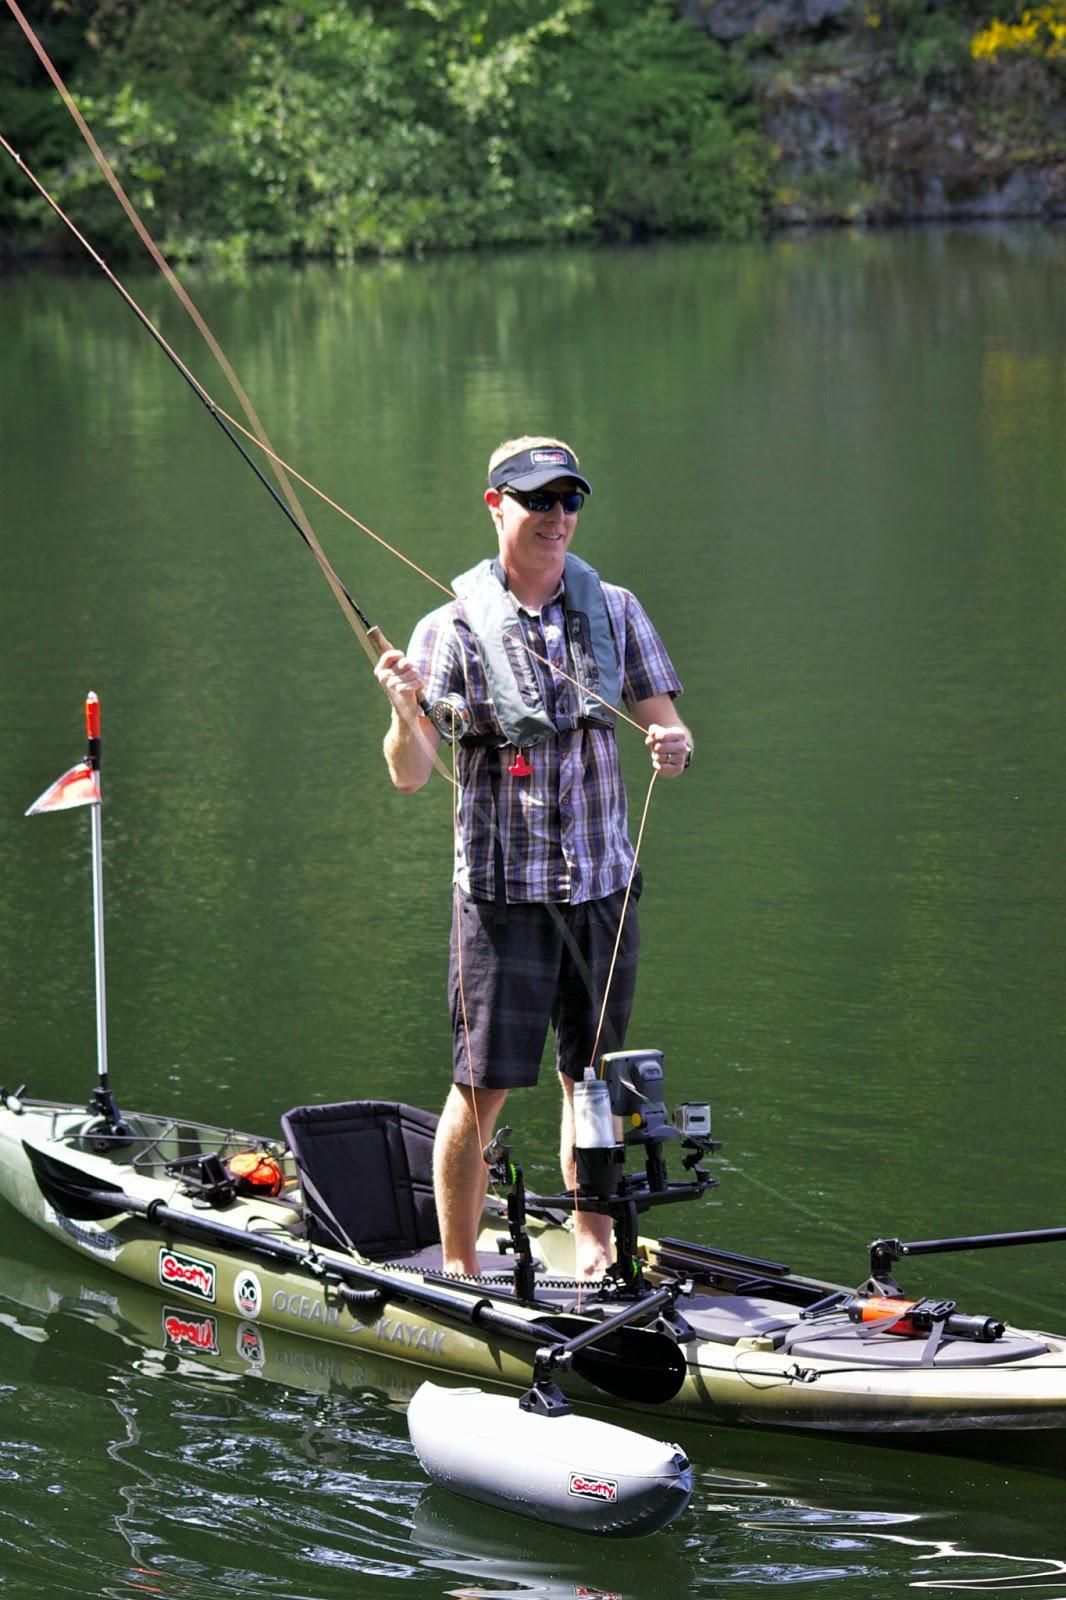 Scotty Stabilizer System_kayak.jpg